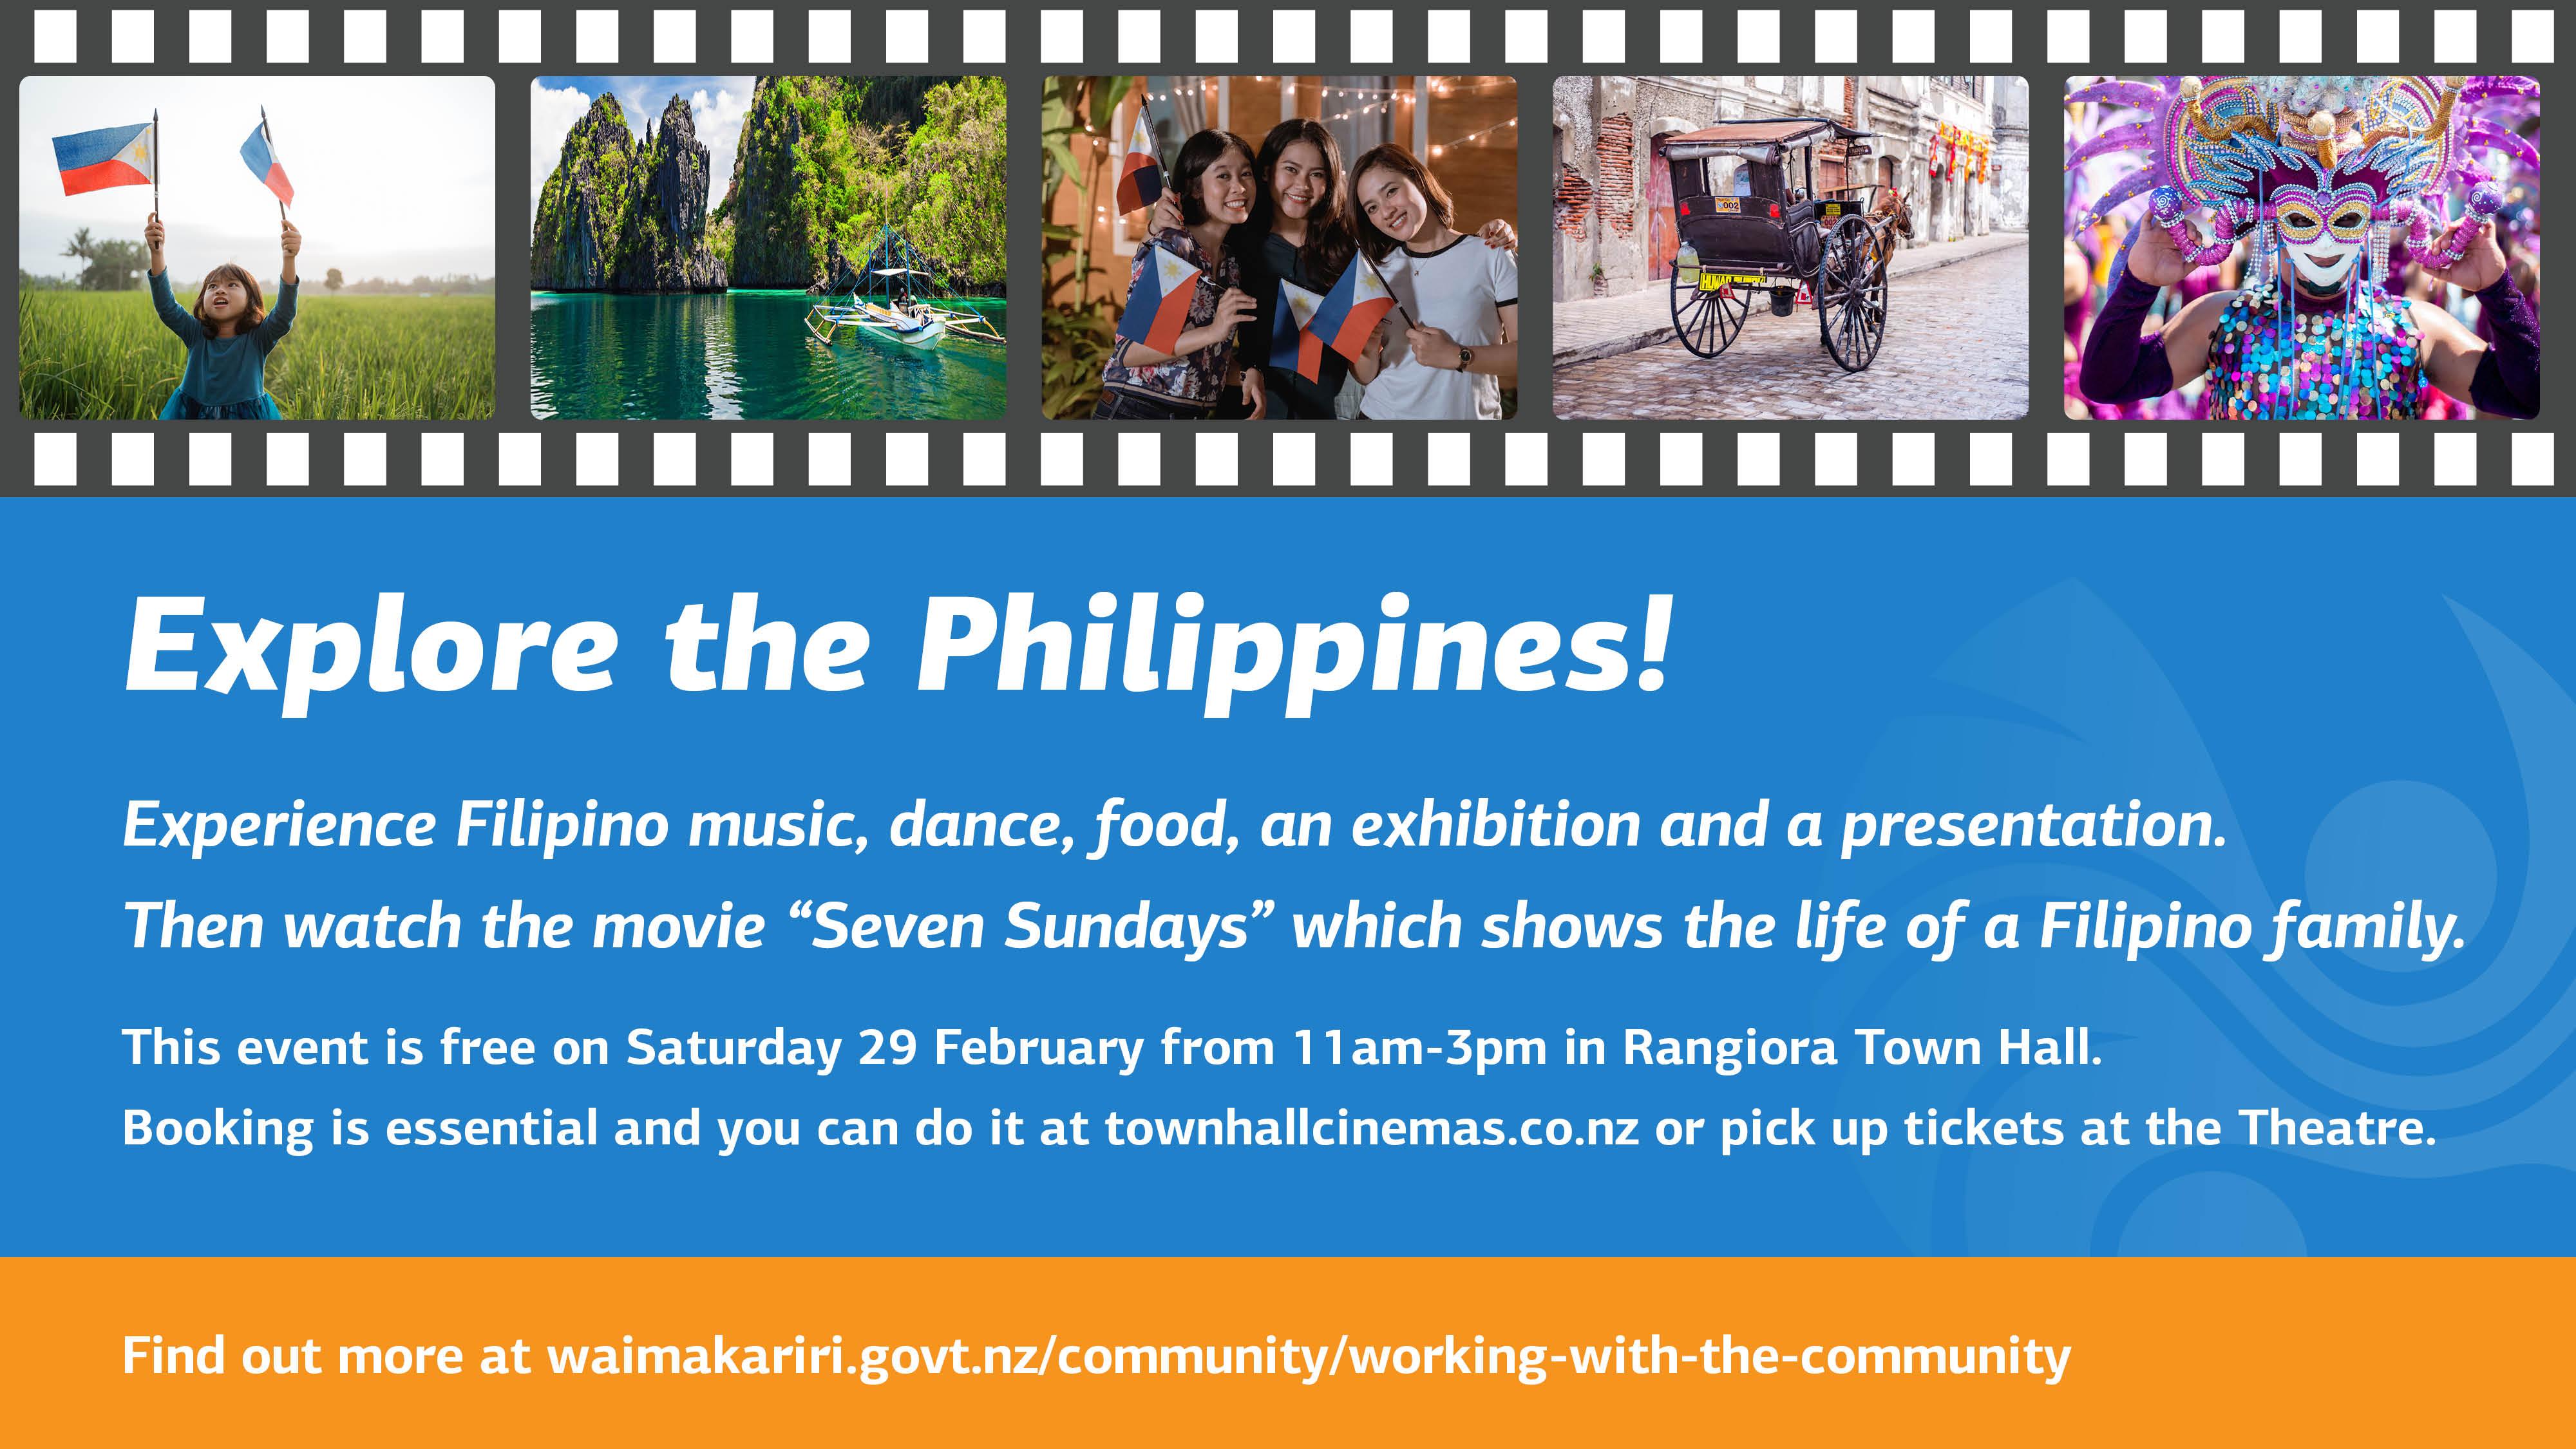 Explore the Philippines movie presentation - 29 Feb at 11am